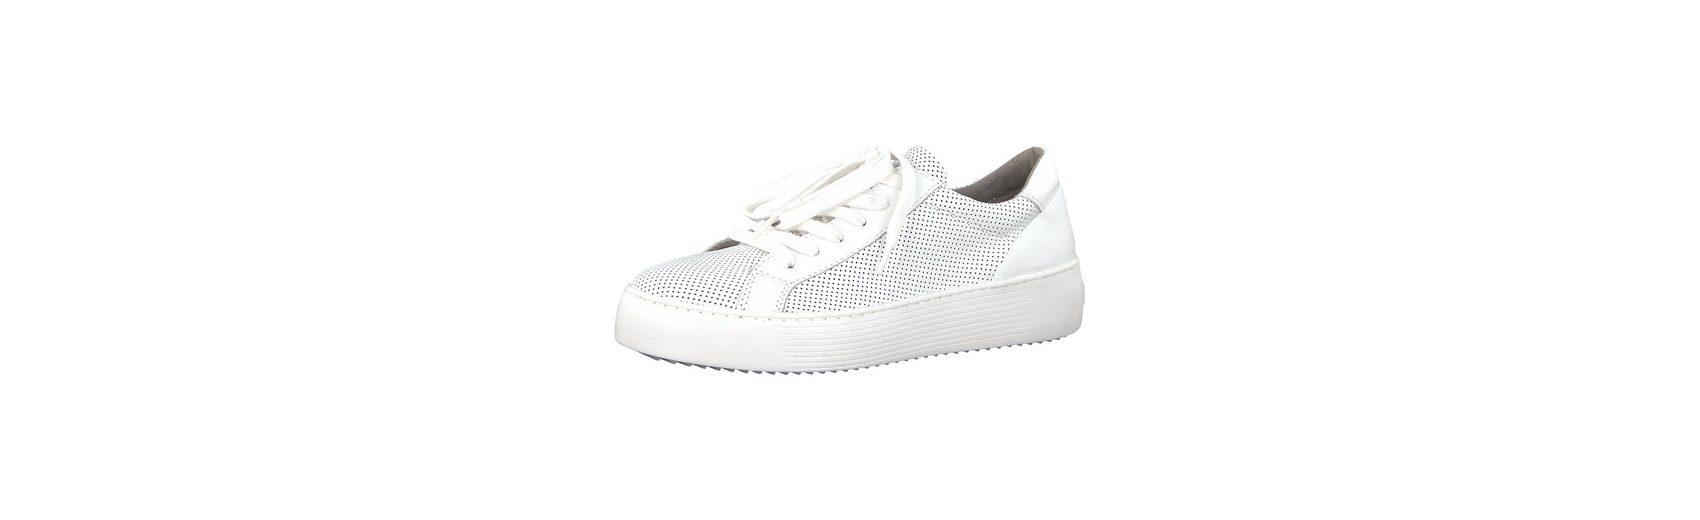 Tamaris Sneakers Low Footlocker Finish Online Nagelneu Unisex LkZiuss9vg